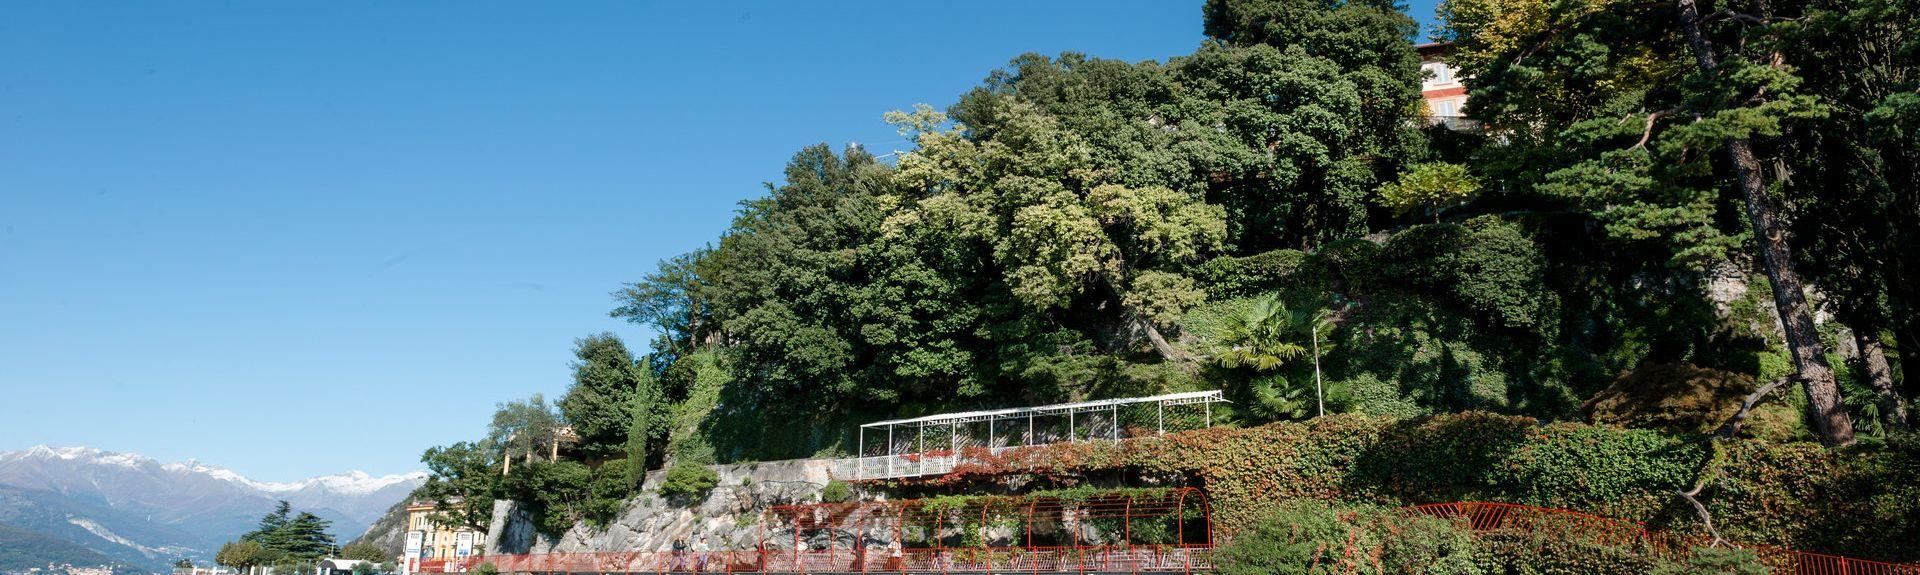 Dizzasco, Lombardia, Itália